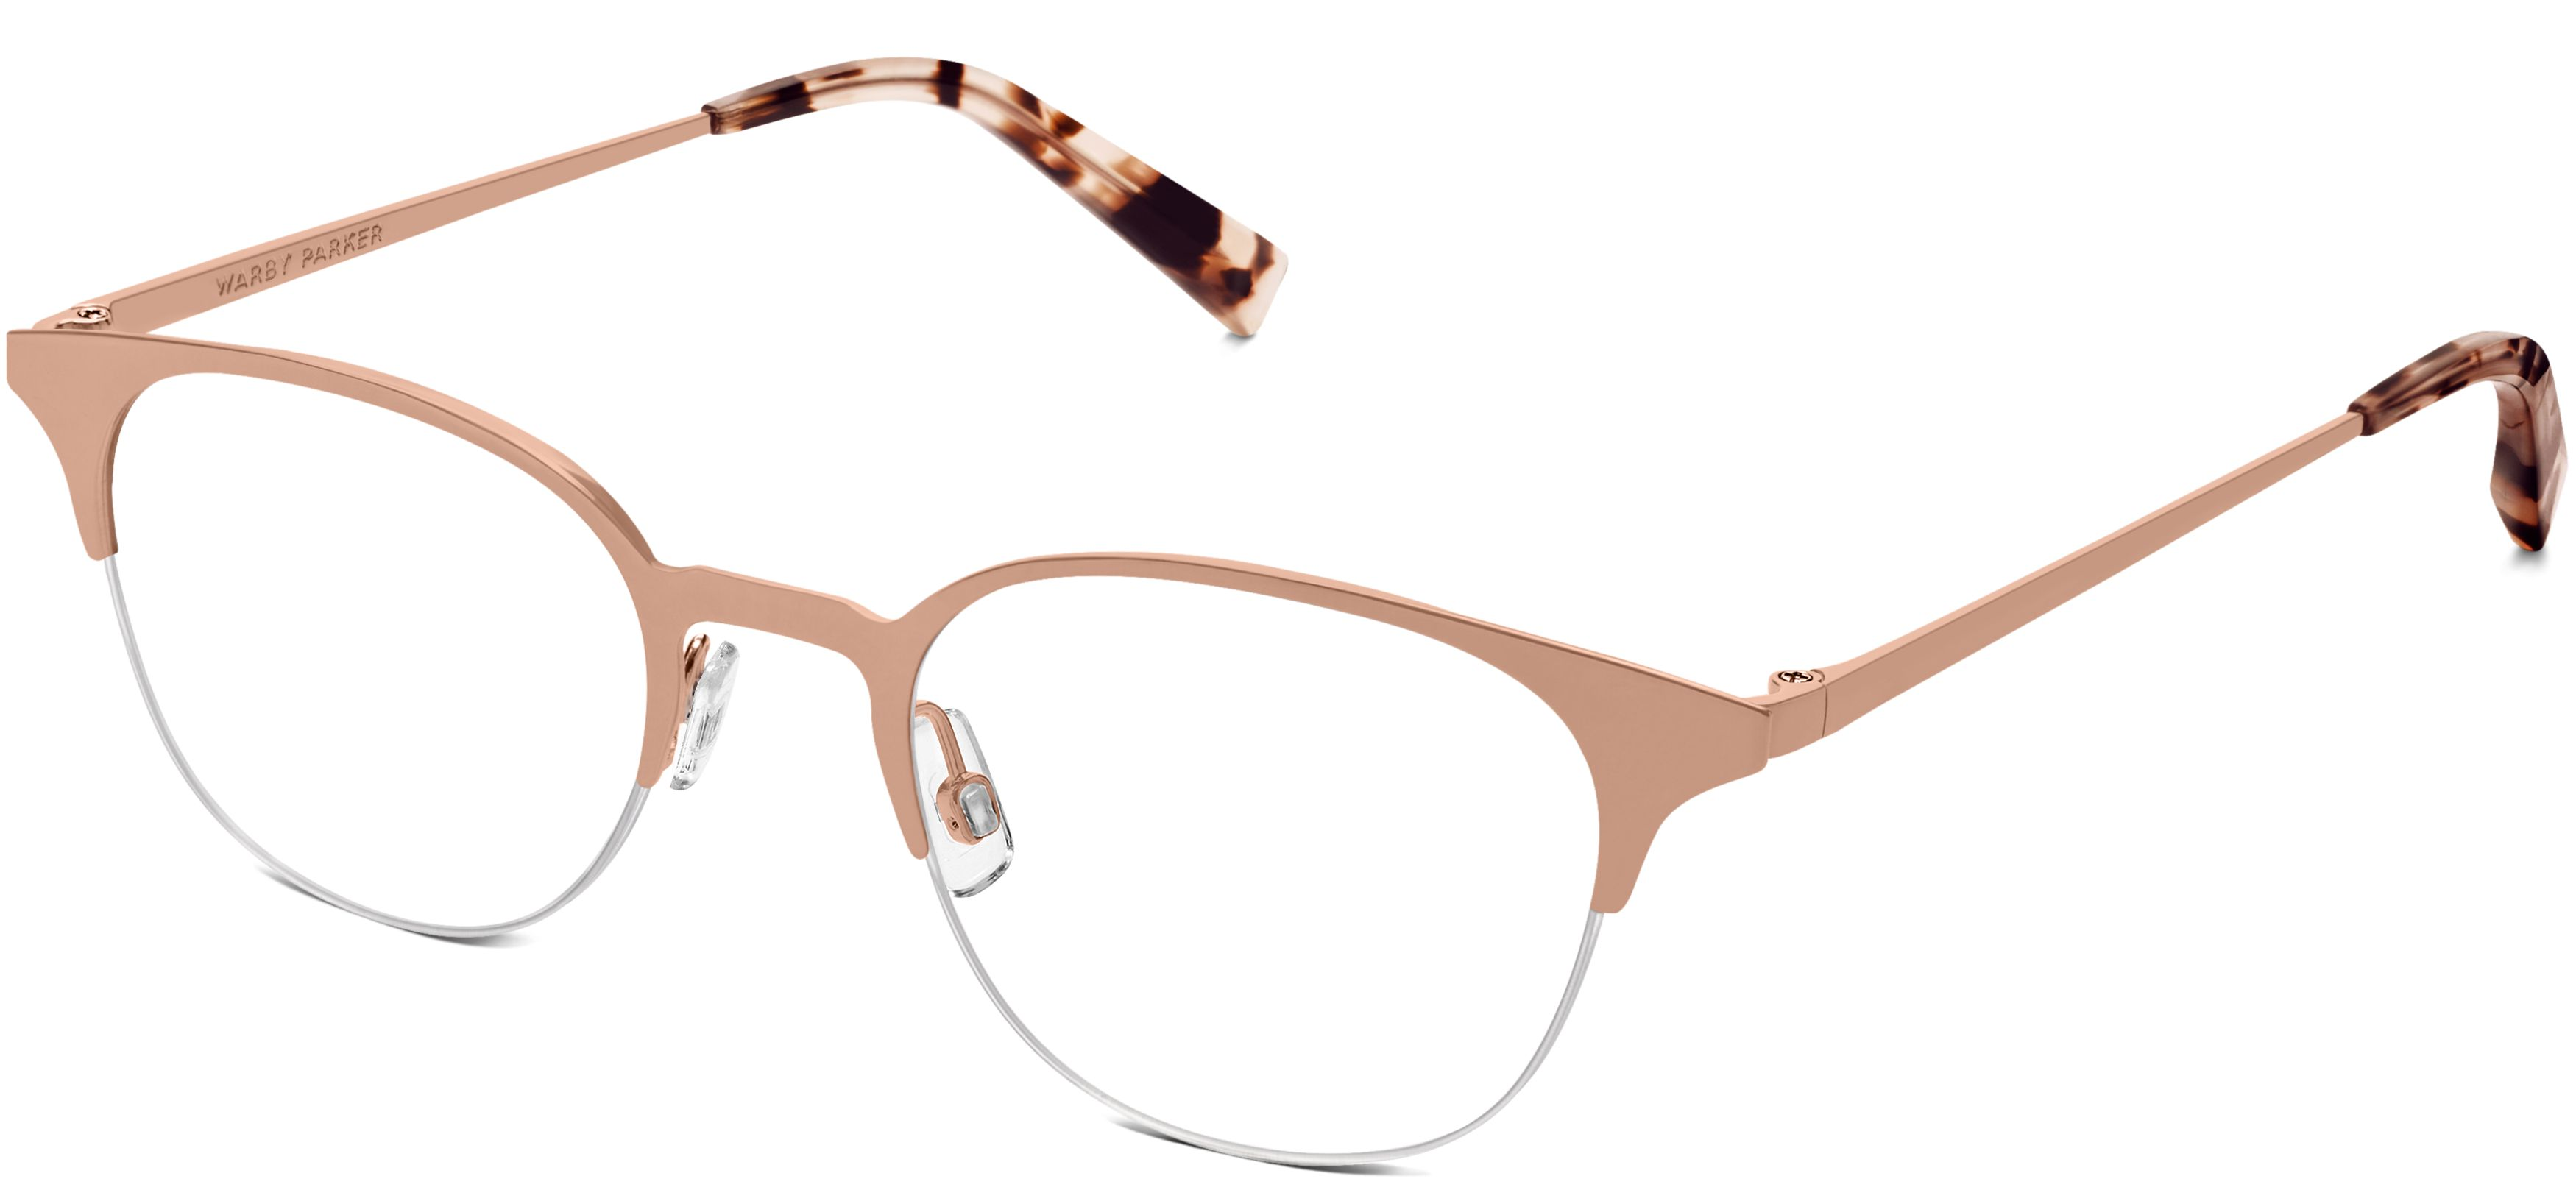 e407d308d8 Violet Eyeglasses in Rose Gold for Women